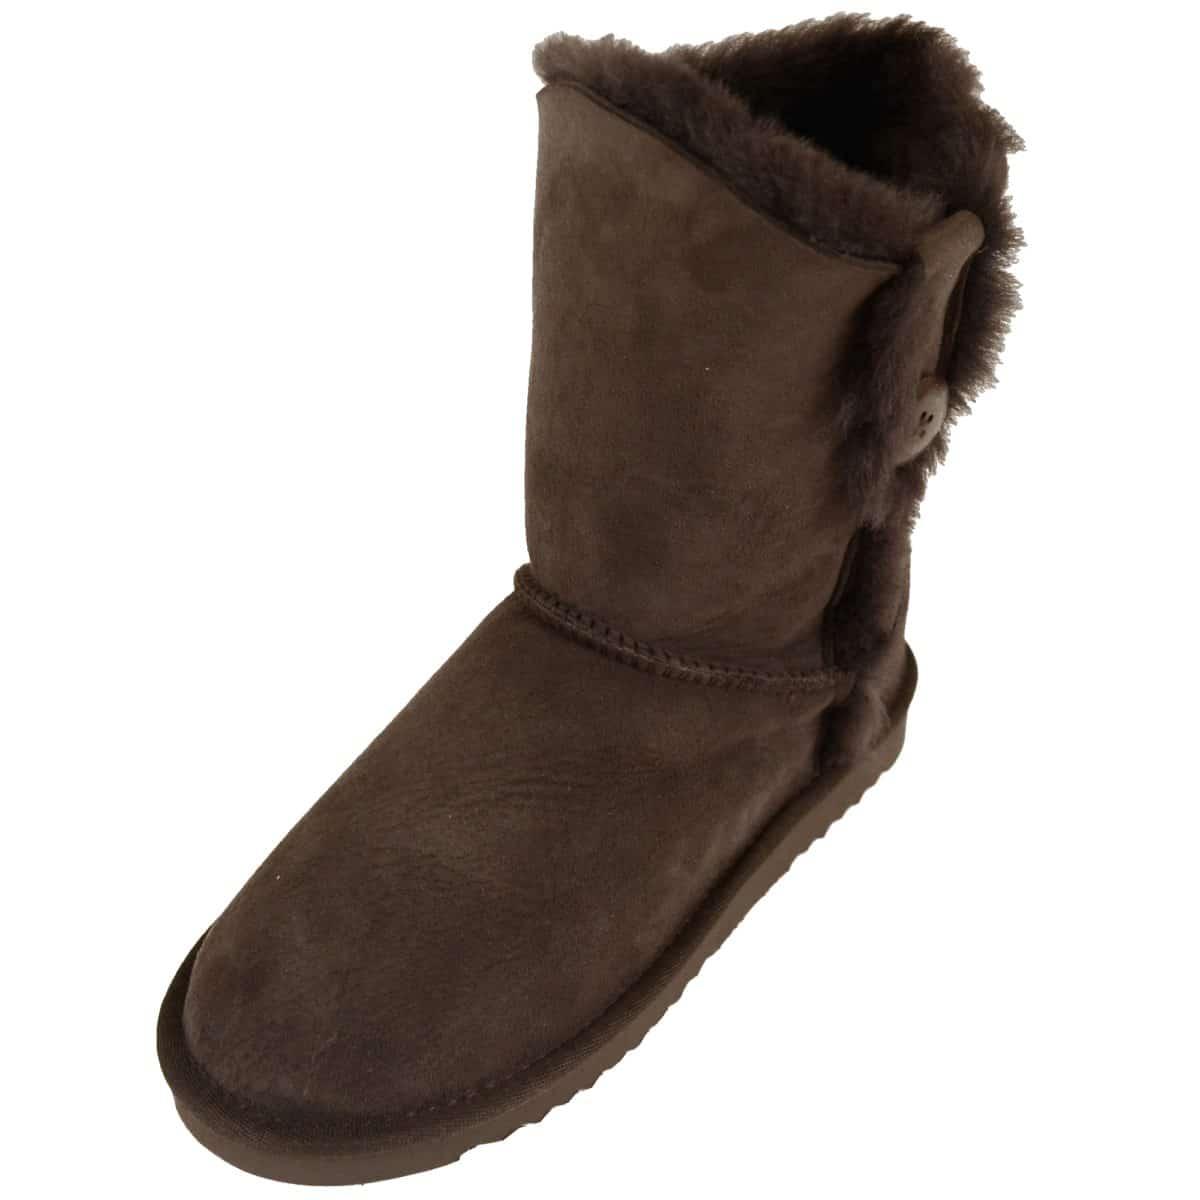 Snugrugs Ladies Sheepskin Boot